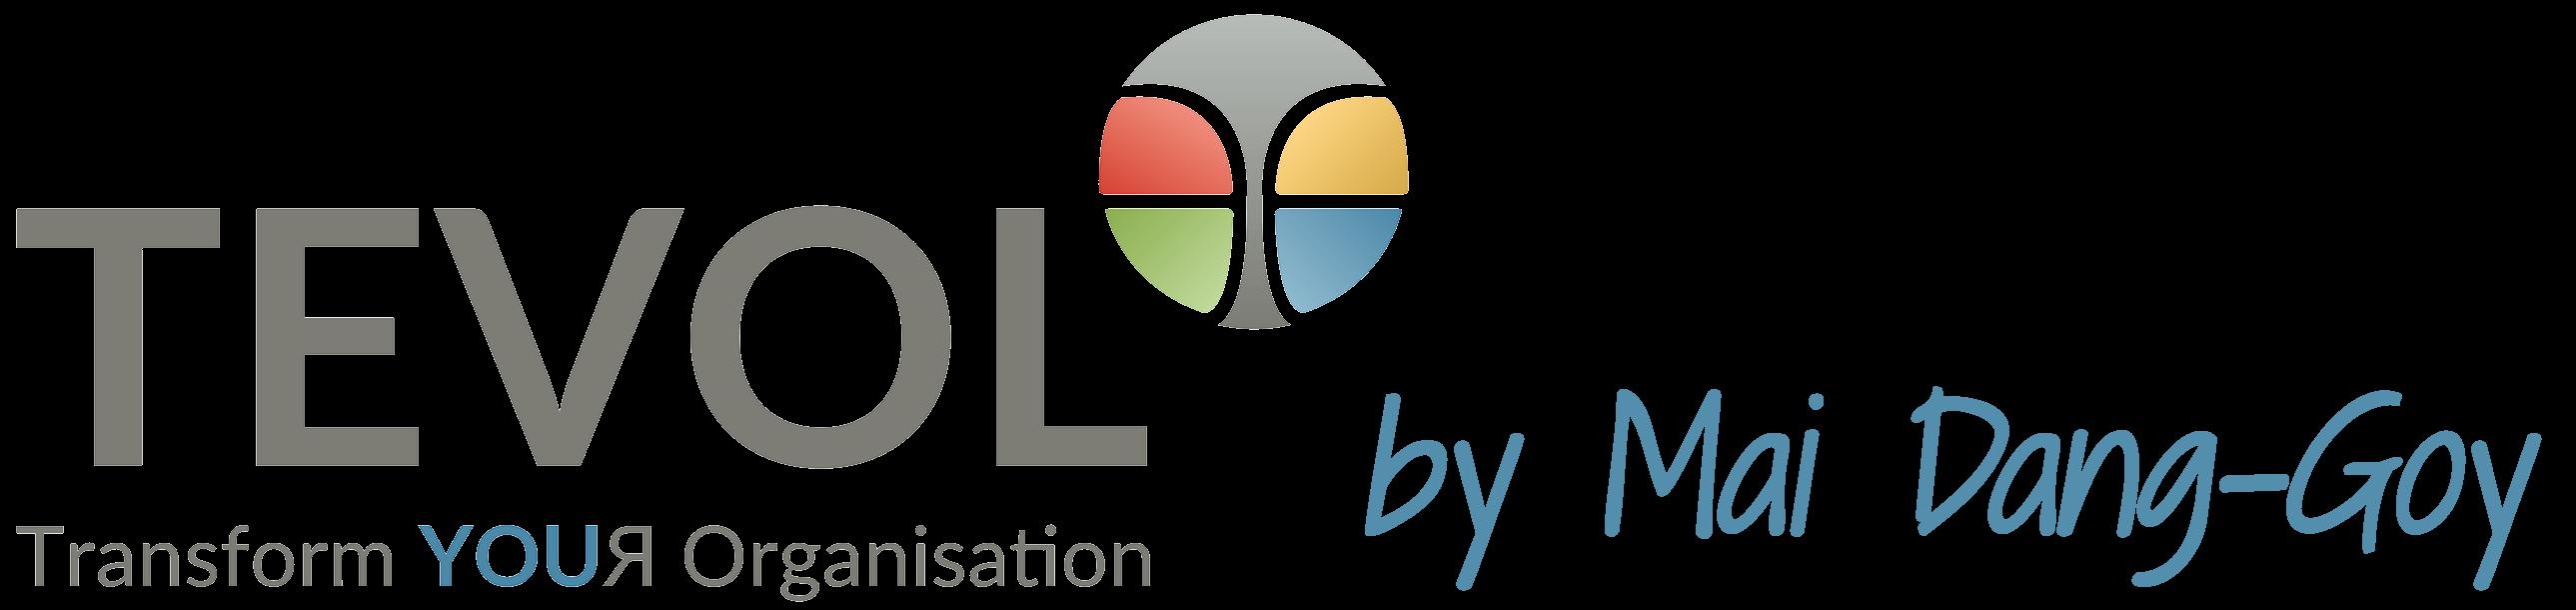 TEVOL – Transform YOUЯ Organisation